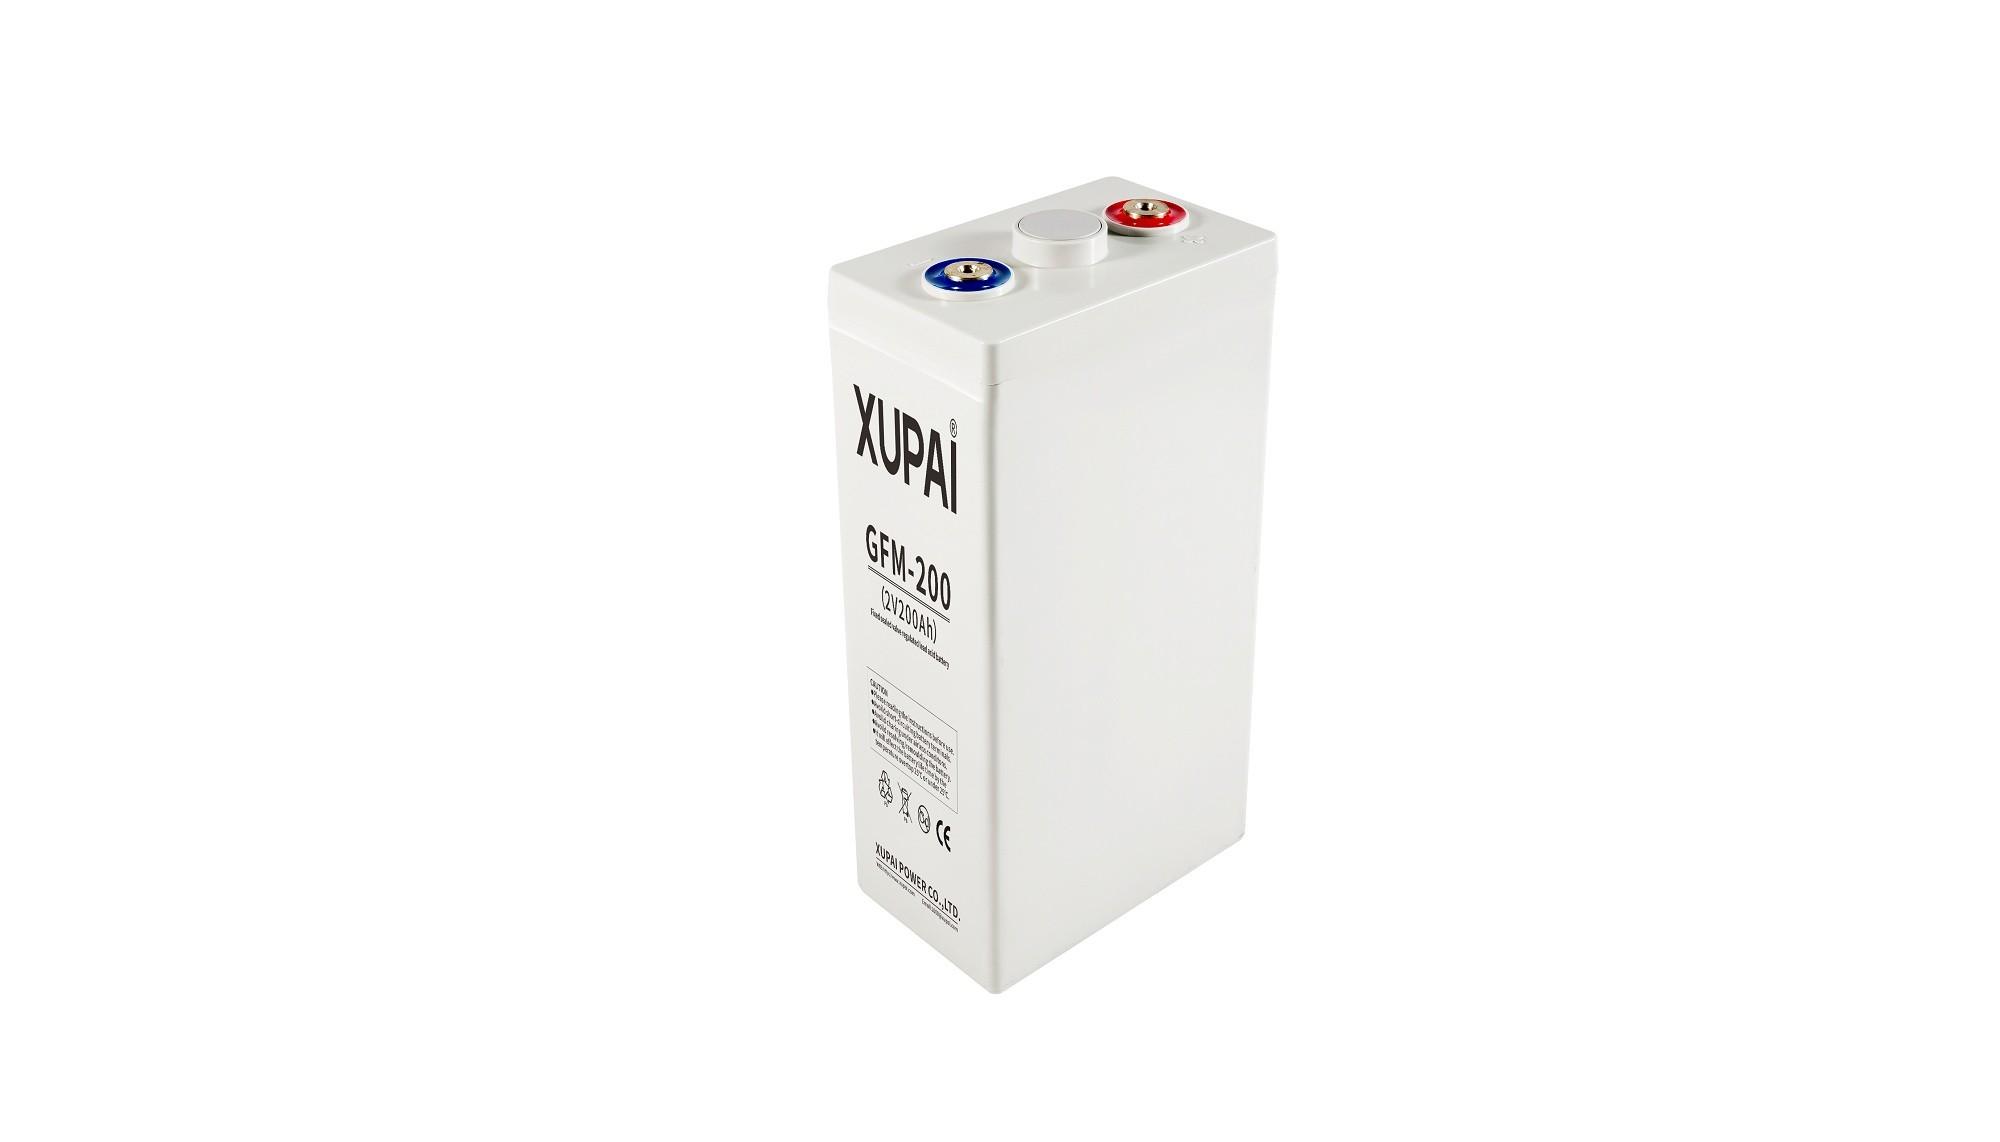 XUPAI GFM-200 long life backup  base station battery